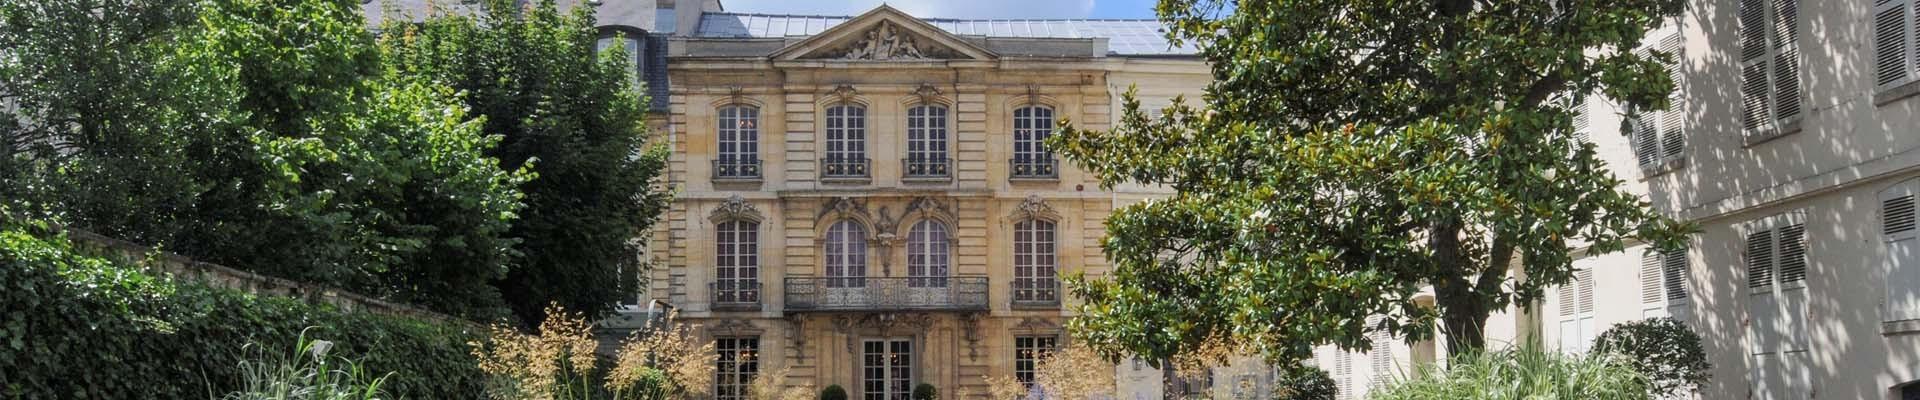 Lambinet museum